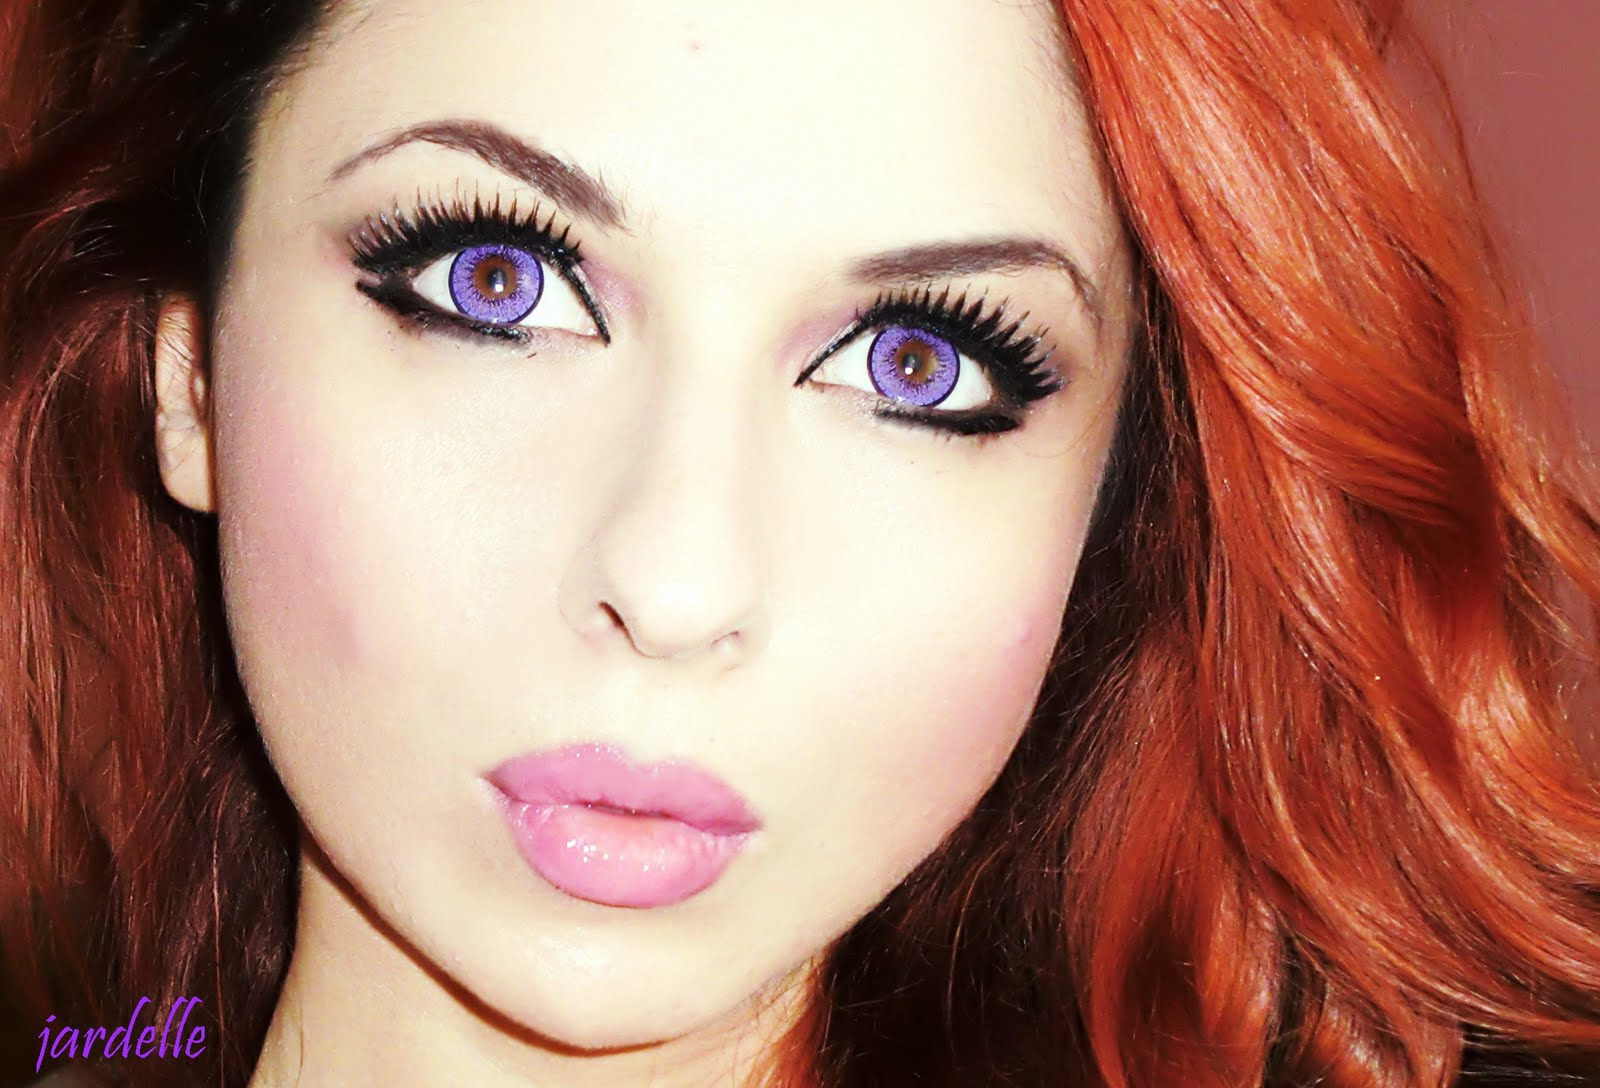 http://4.bp.blogspot.com/-rHVzrgnmPgQ/TliW3KE0pwI/AAAAAAAACRc/6s7al0VfIT0/s1600/jardelle+violet+eyes+1.JPG